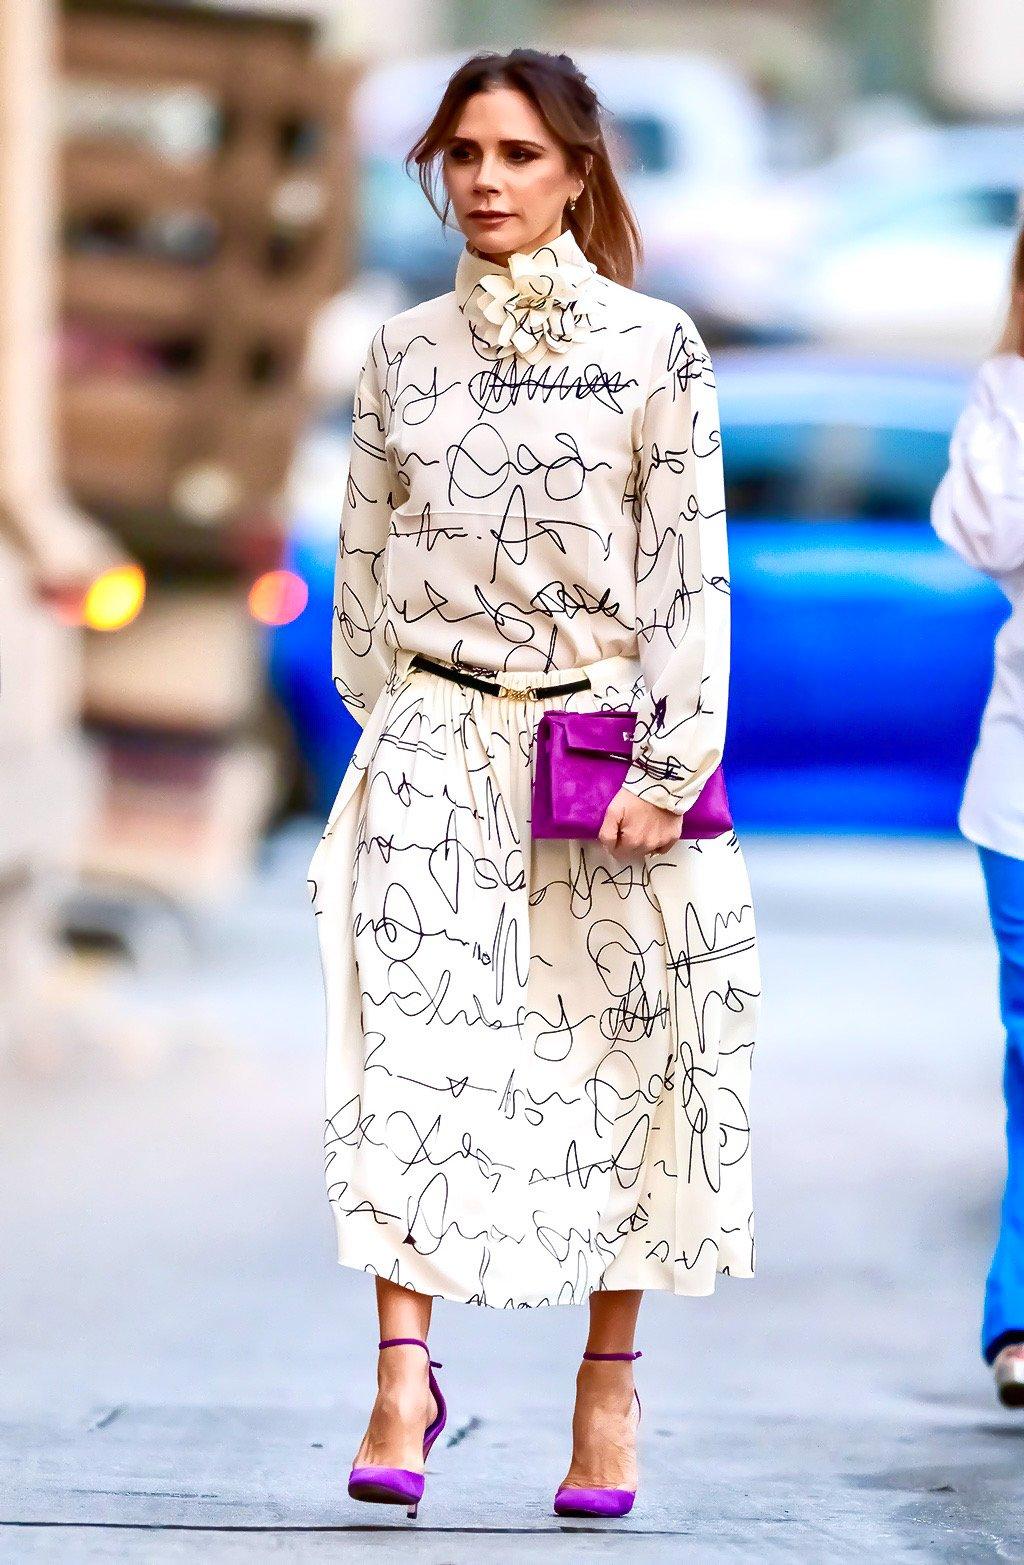 Victoria Beckham walking to Jimmy Kimmel Live! wearing her own Spring 2020 Victoria Beckham Long-sleeved Dolman Midi Dress in Scribble Print